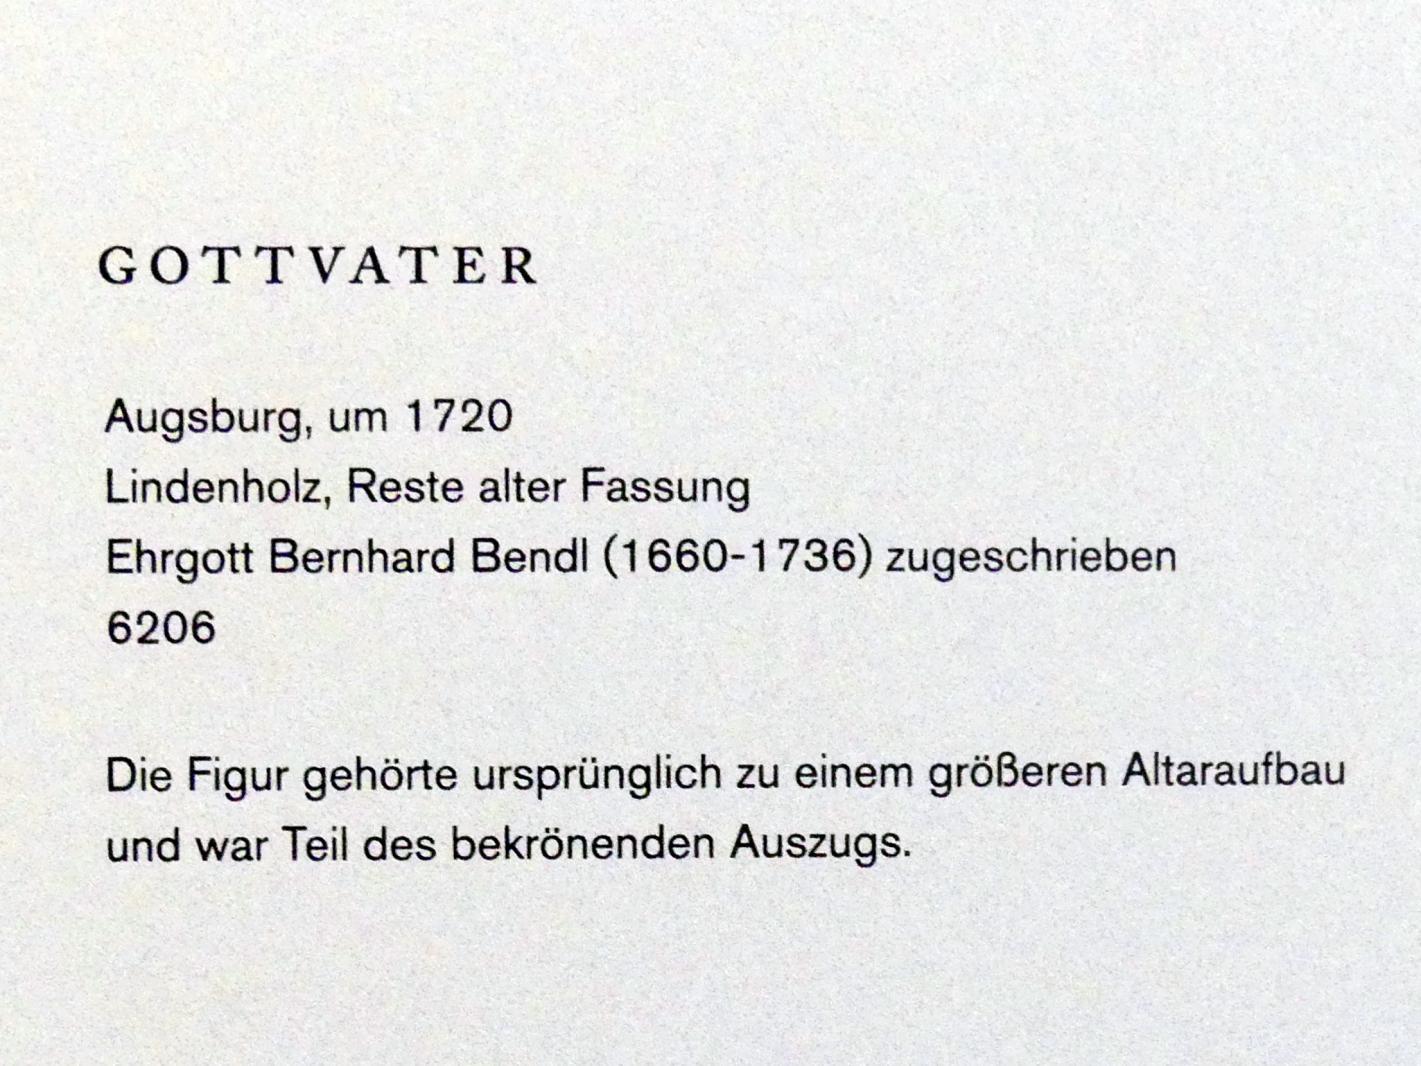 Ehrgott Bernhard Bendl: Gottvater, um 1720, Bild 3/3